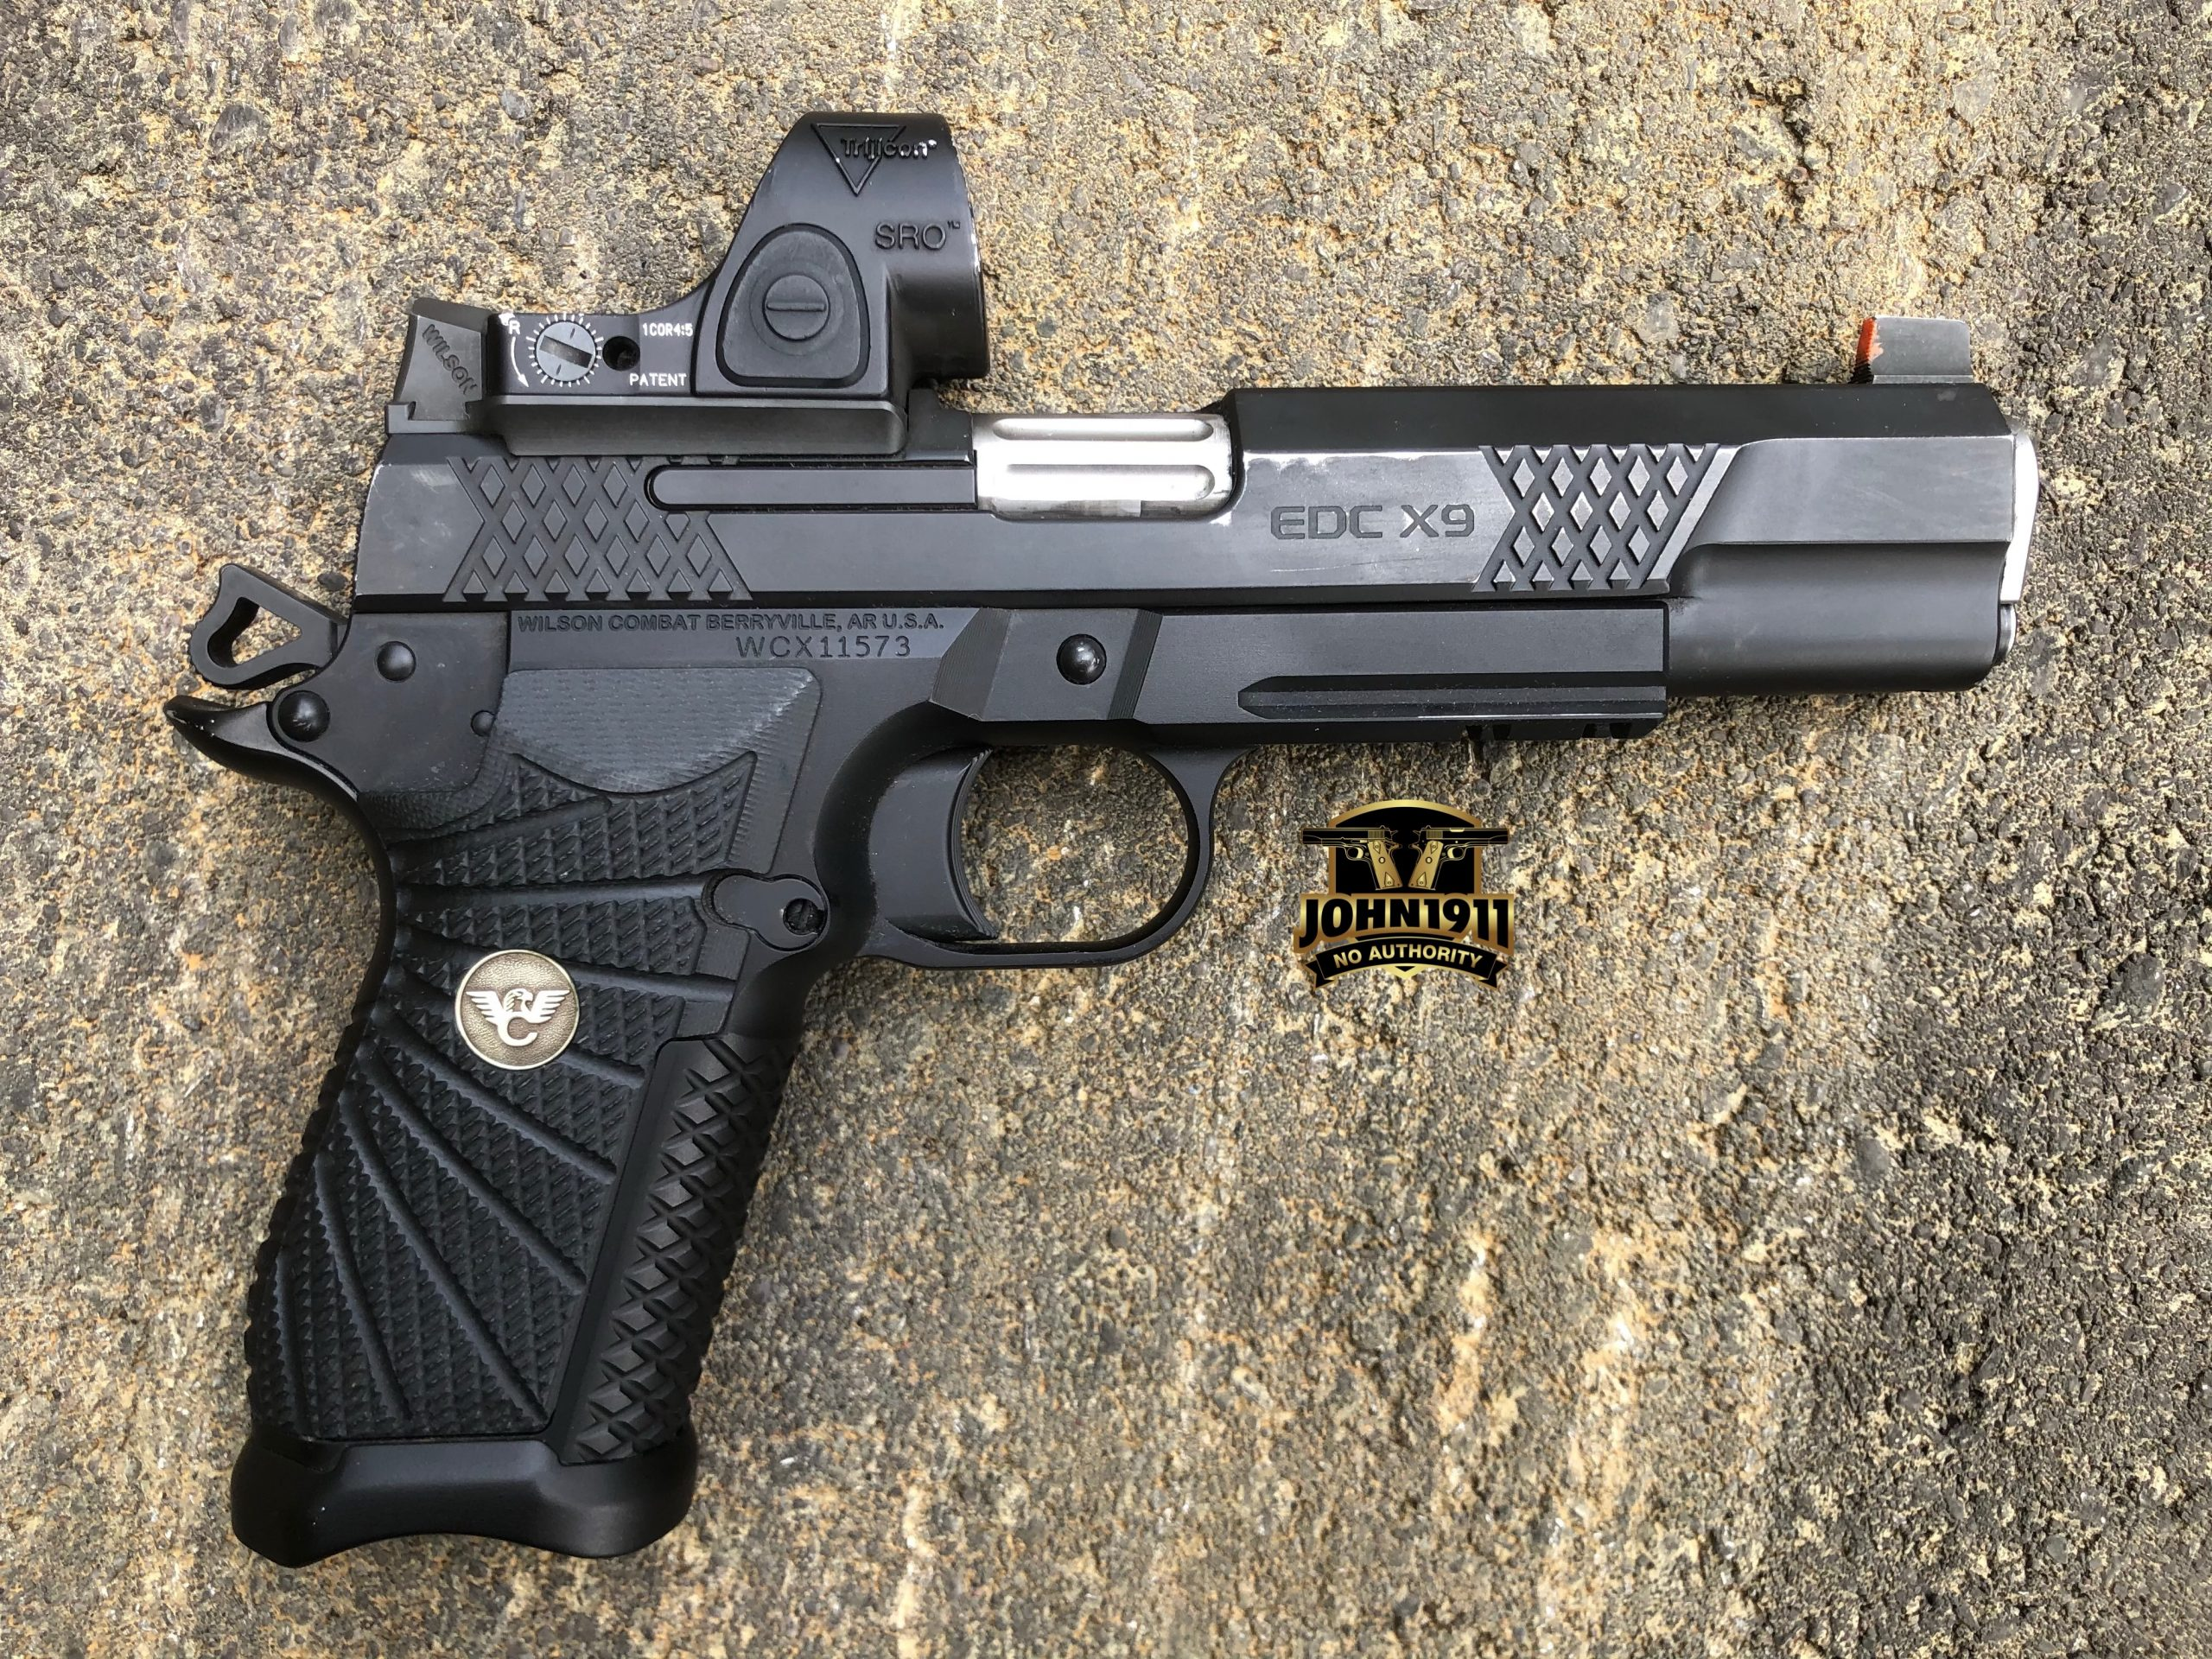 Wilson EDC X9, X9L Holster Wear. The 13 P's of gun wear.